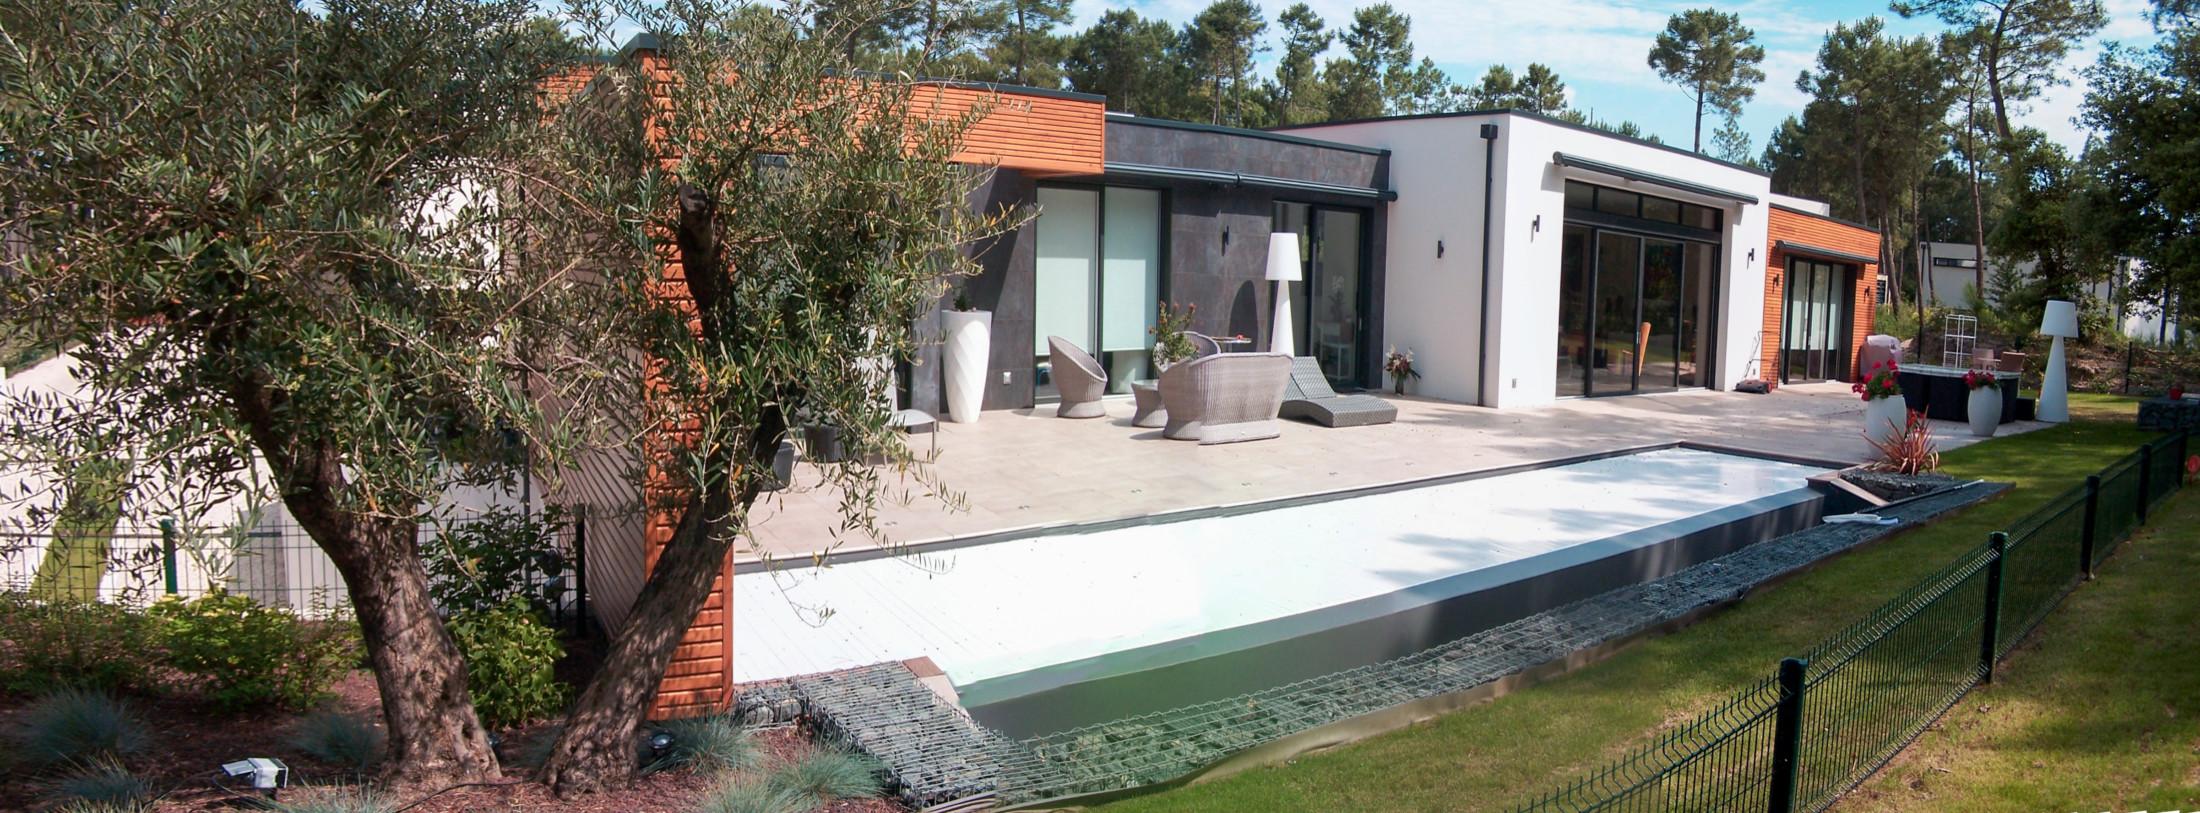 jardin-golf-piscine-idspace